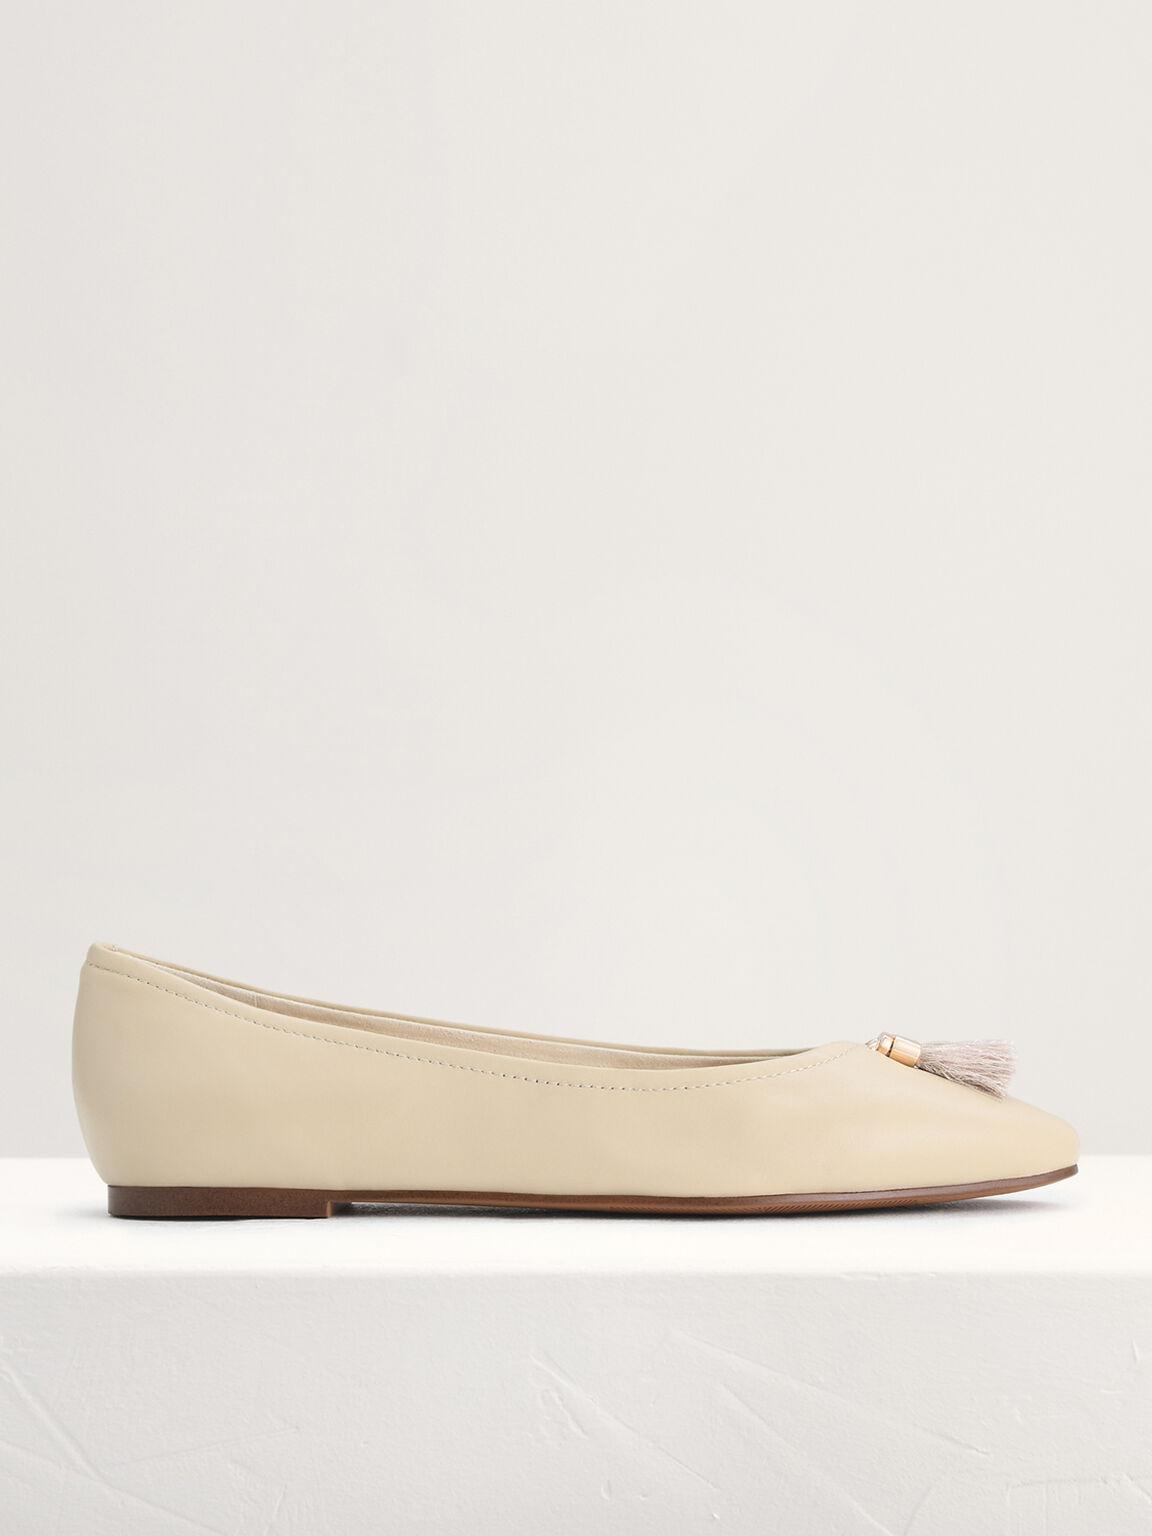 Leather Ballerina Flats, Beige, hi-res